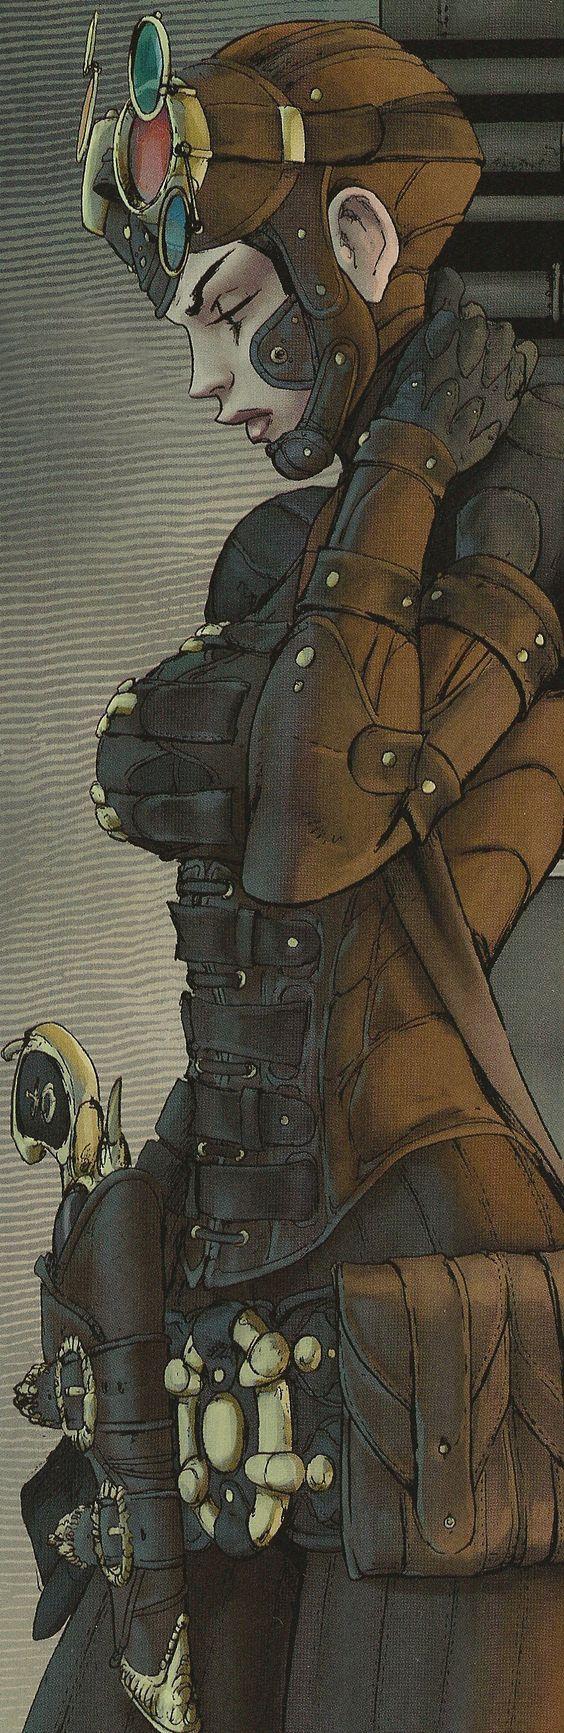 Lady Mechanik